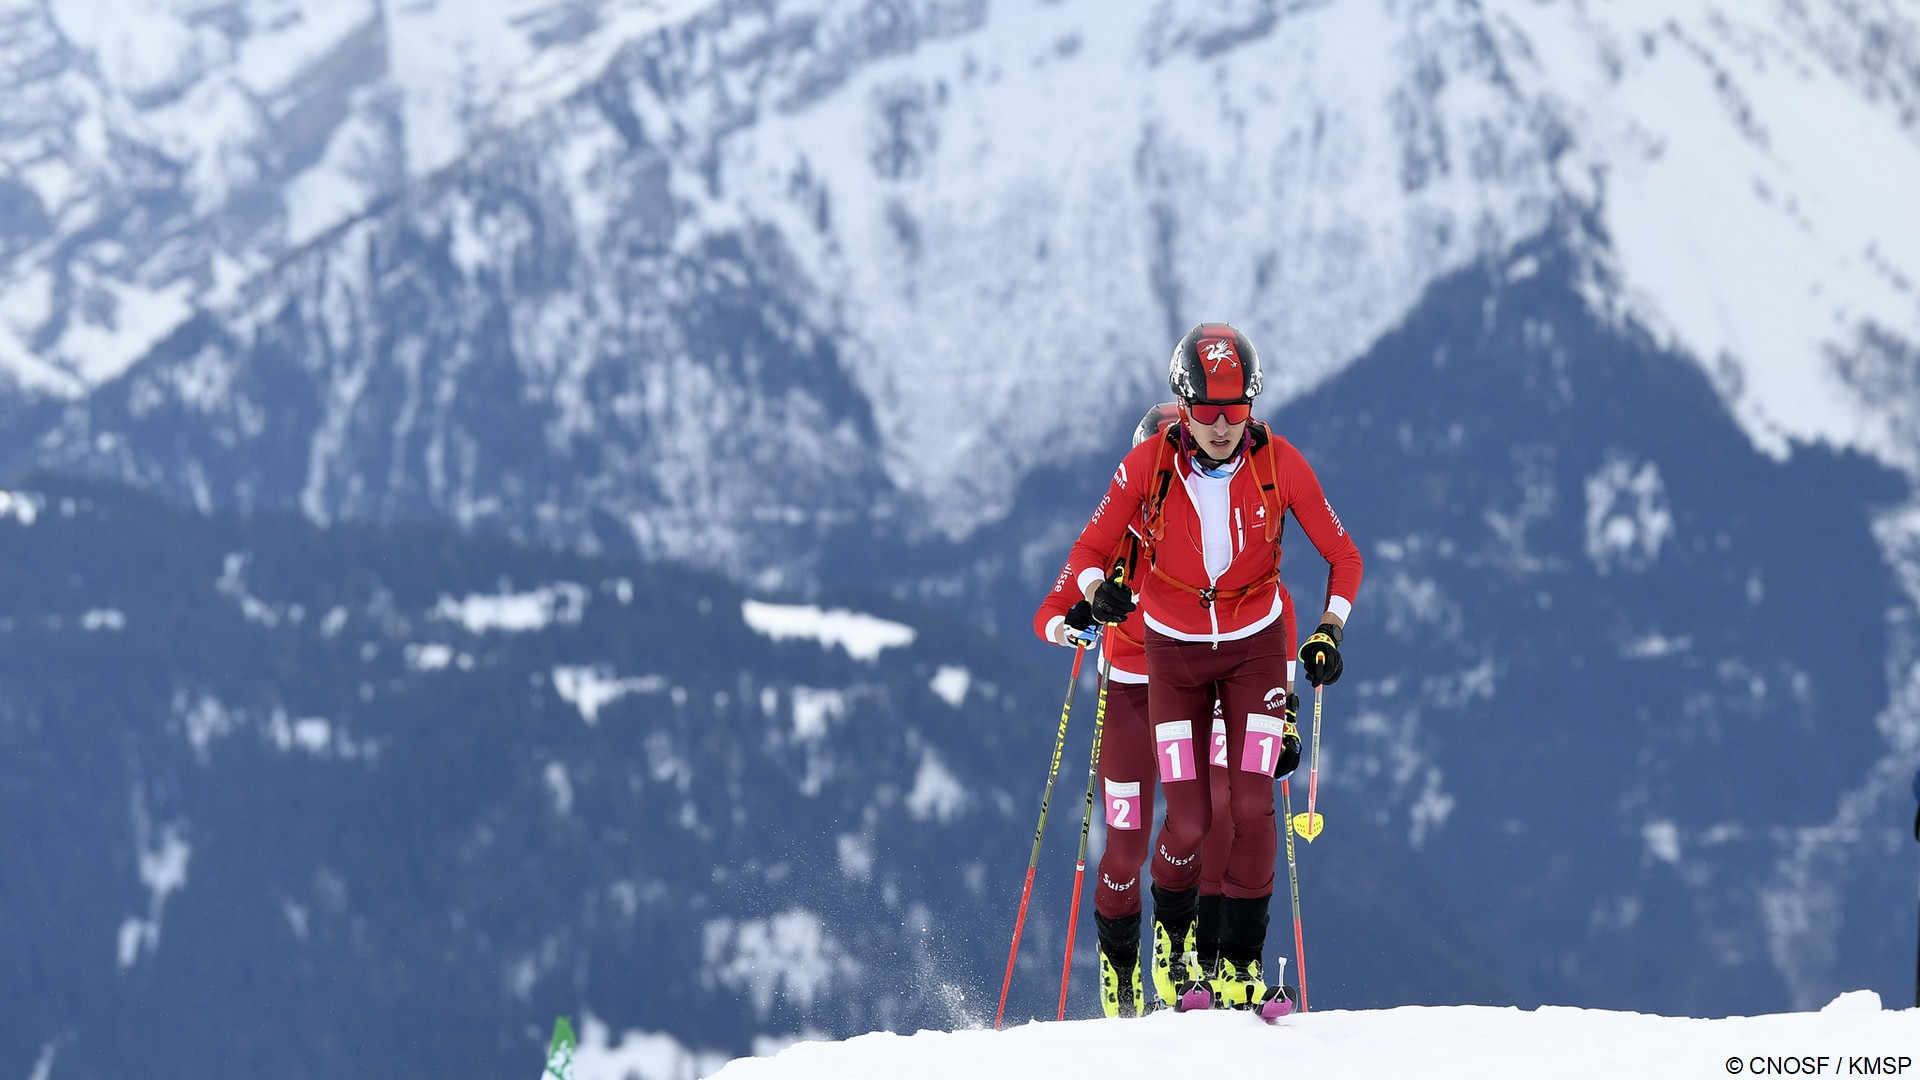 Ski alpinisme (1) Lausanne 2020